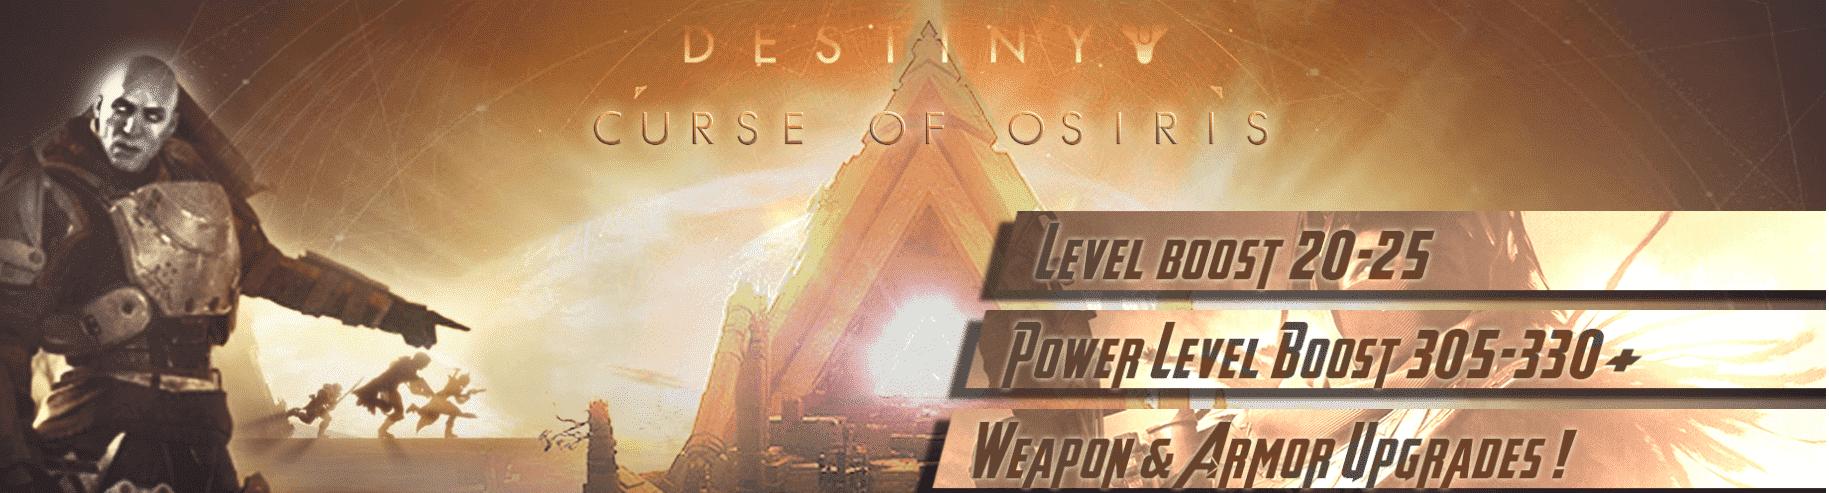 Curse Of Osiris Power Level Boost